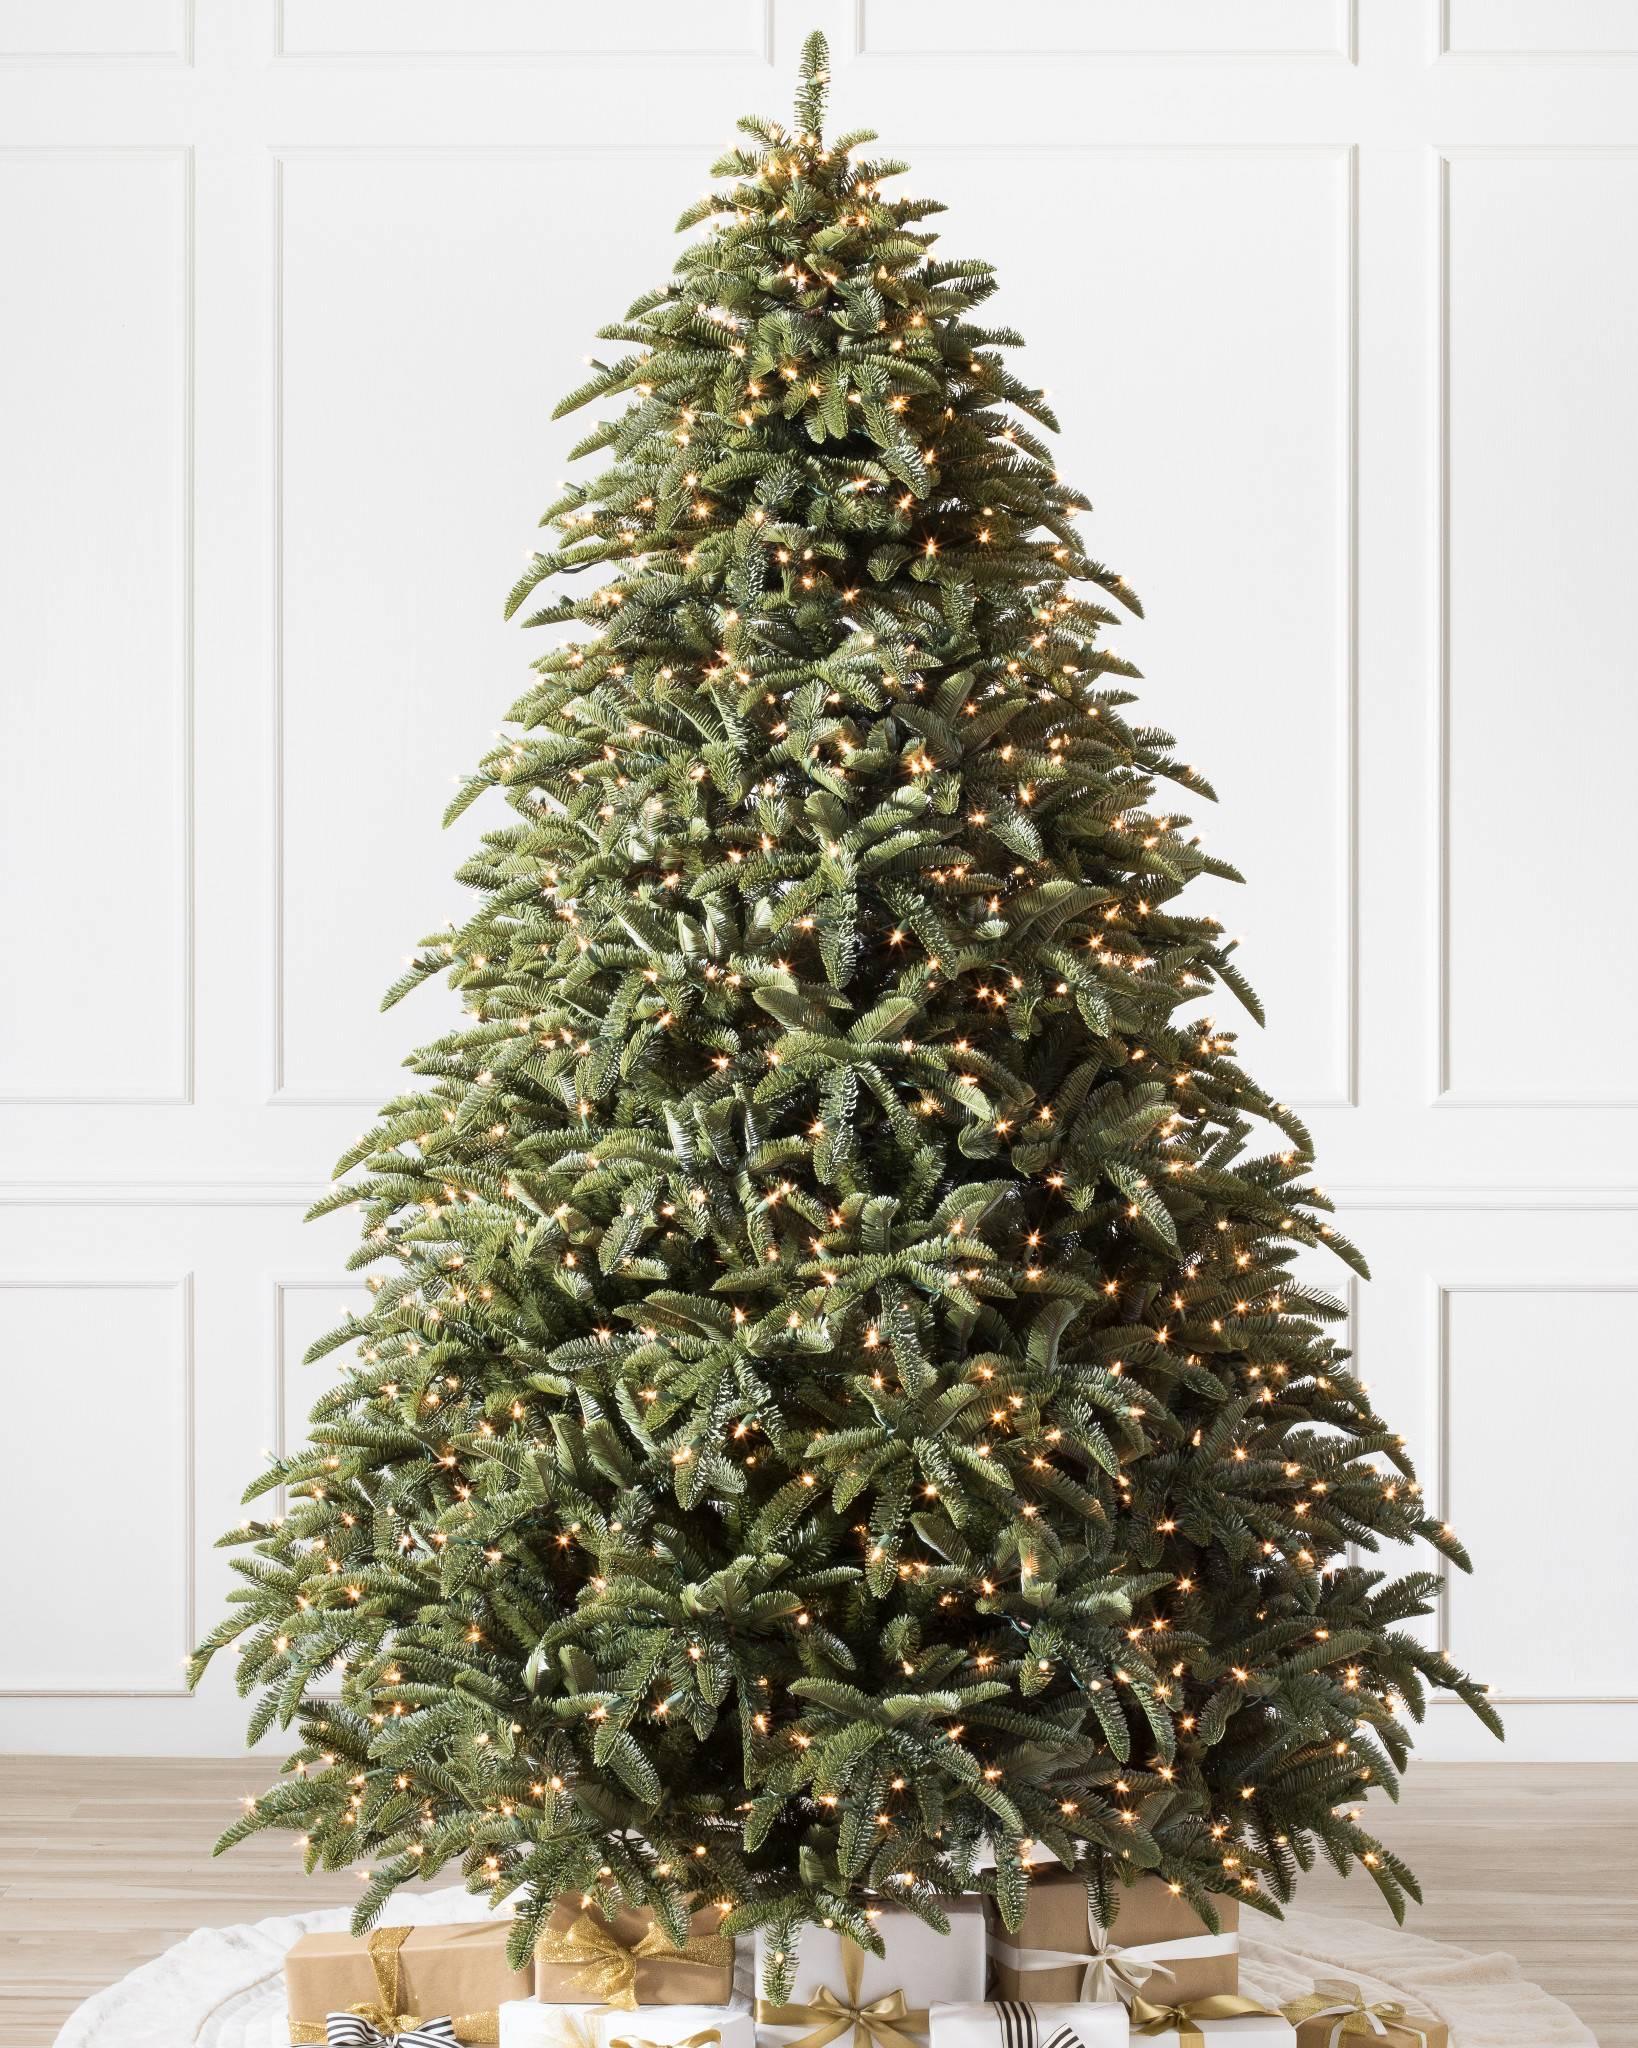 Artificial Christmas Trees Uk.Noble Fir Artificial Christmas Tree Balsam Hill